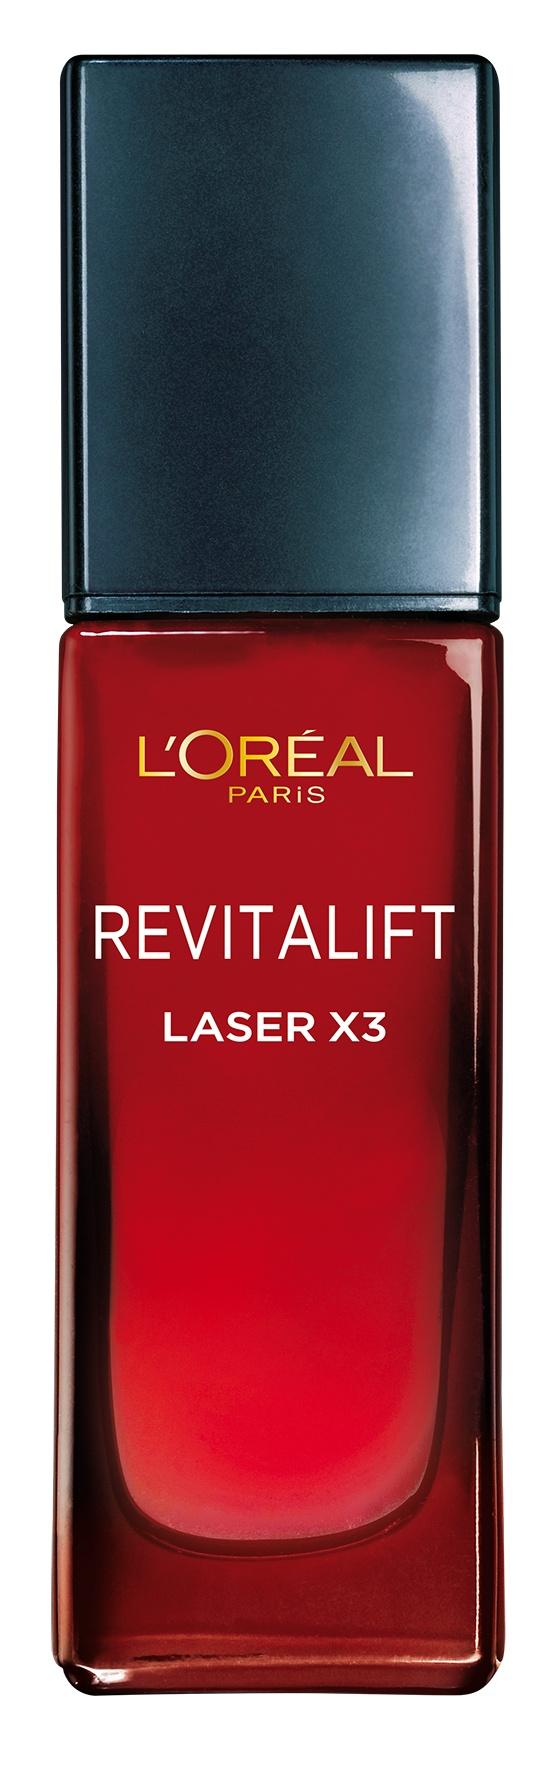 L'Oreal Revitalift Laser x3 serum